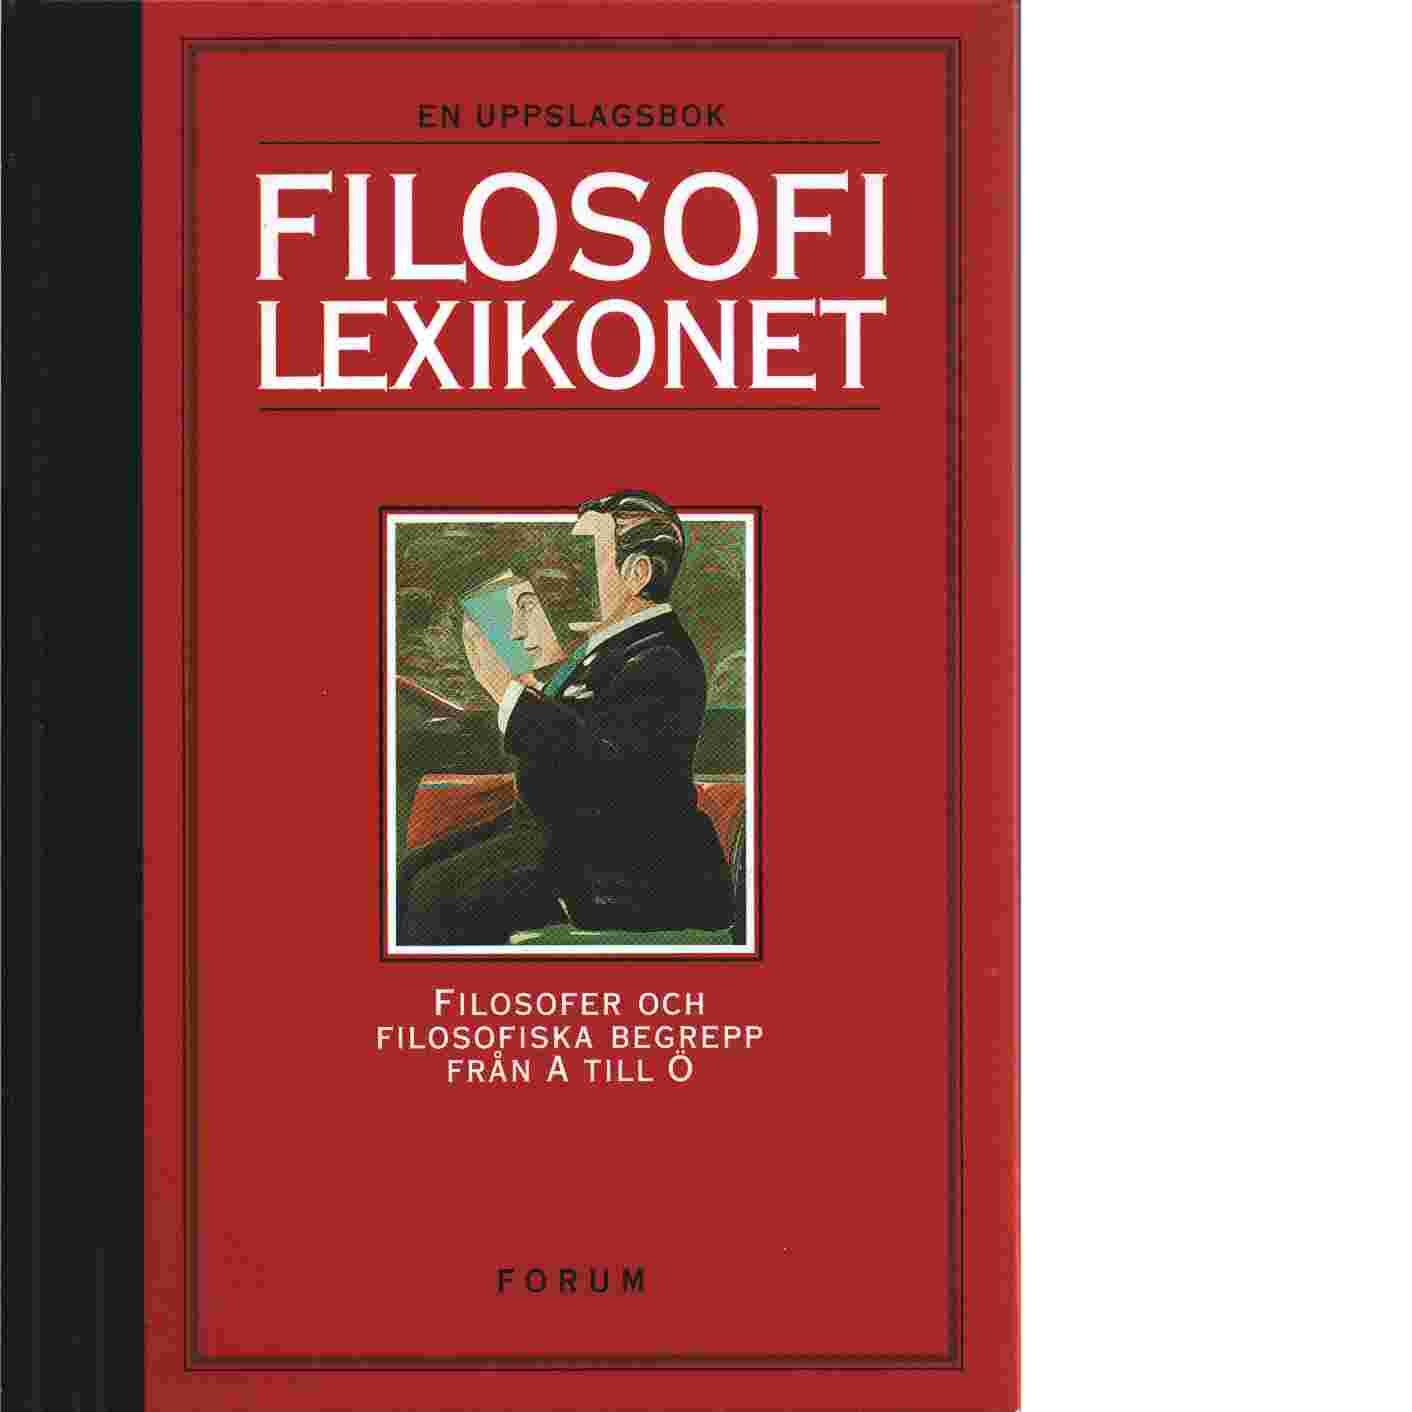 Filosofilexikonet - Grøn, Arne,  Lübcke, Poul ,  Bengtsson, Jan, Hartman, Jan,   Pagin, Peter, och  Prawitz, Dag